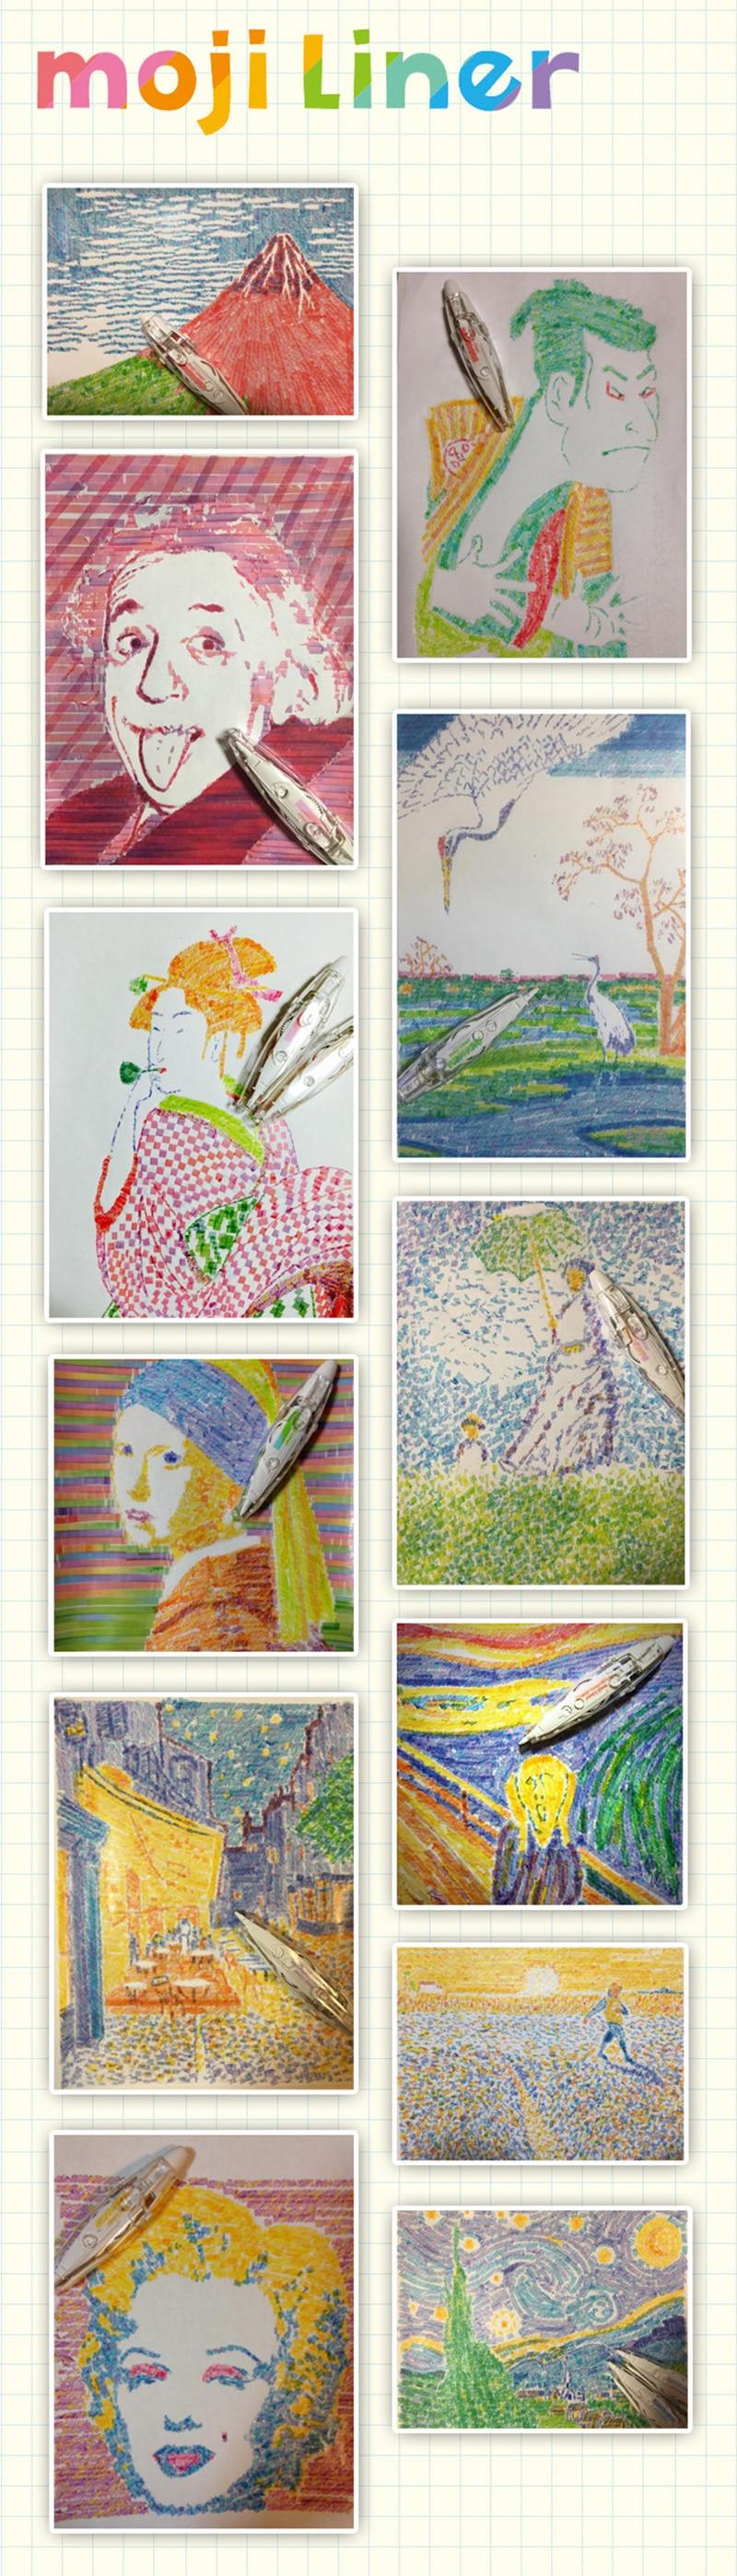 5pcs Lovely Stacker Swap Tip 7 Colors Wax Crayon Pencil Set Filler Kids Drawing